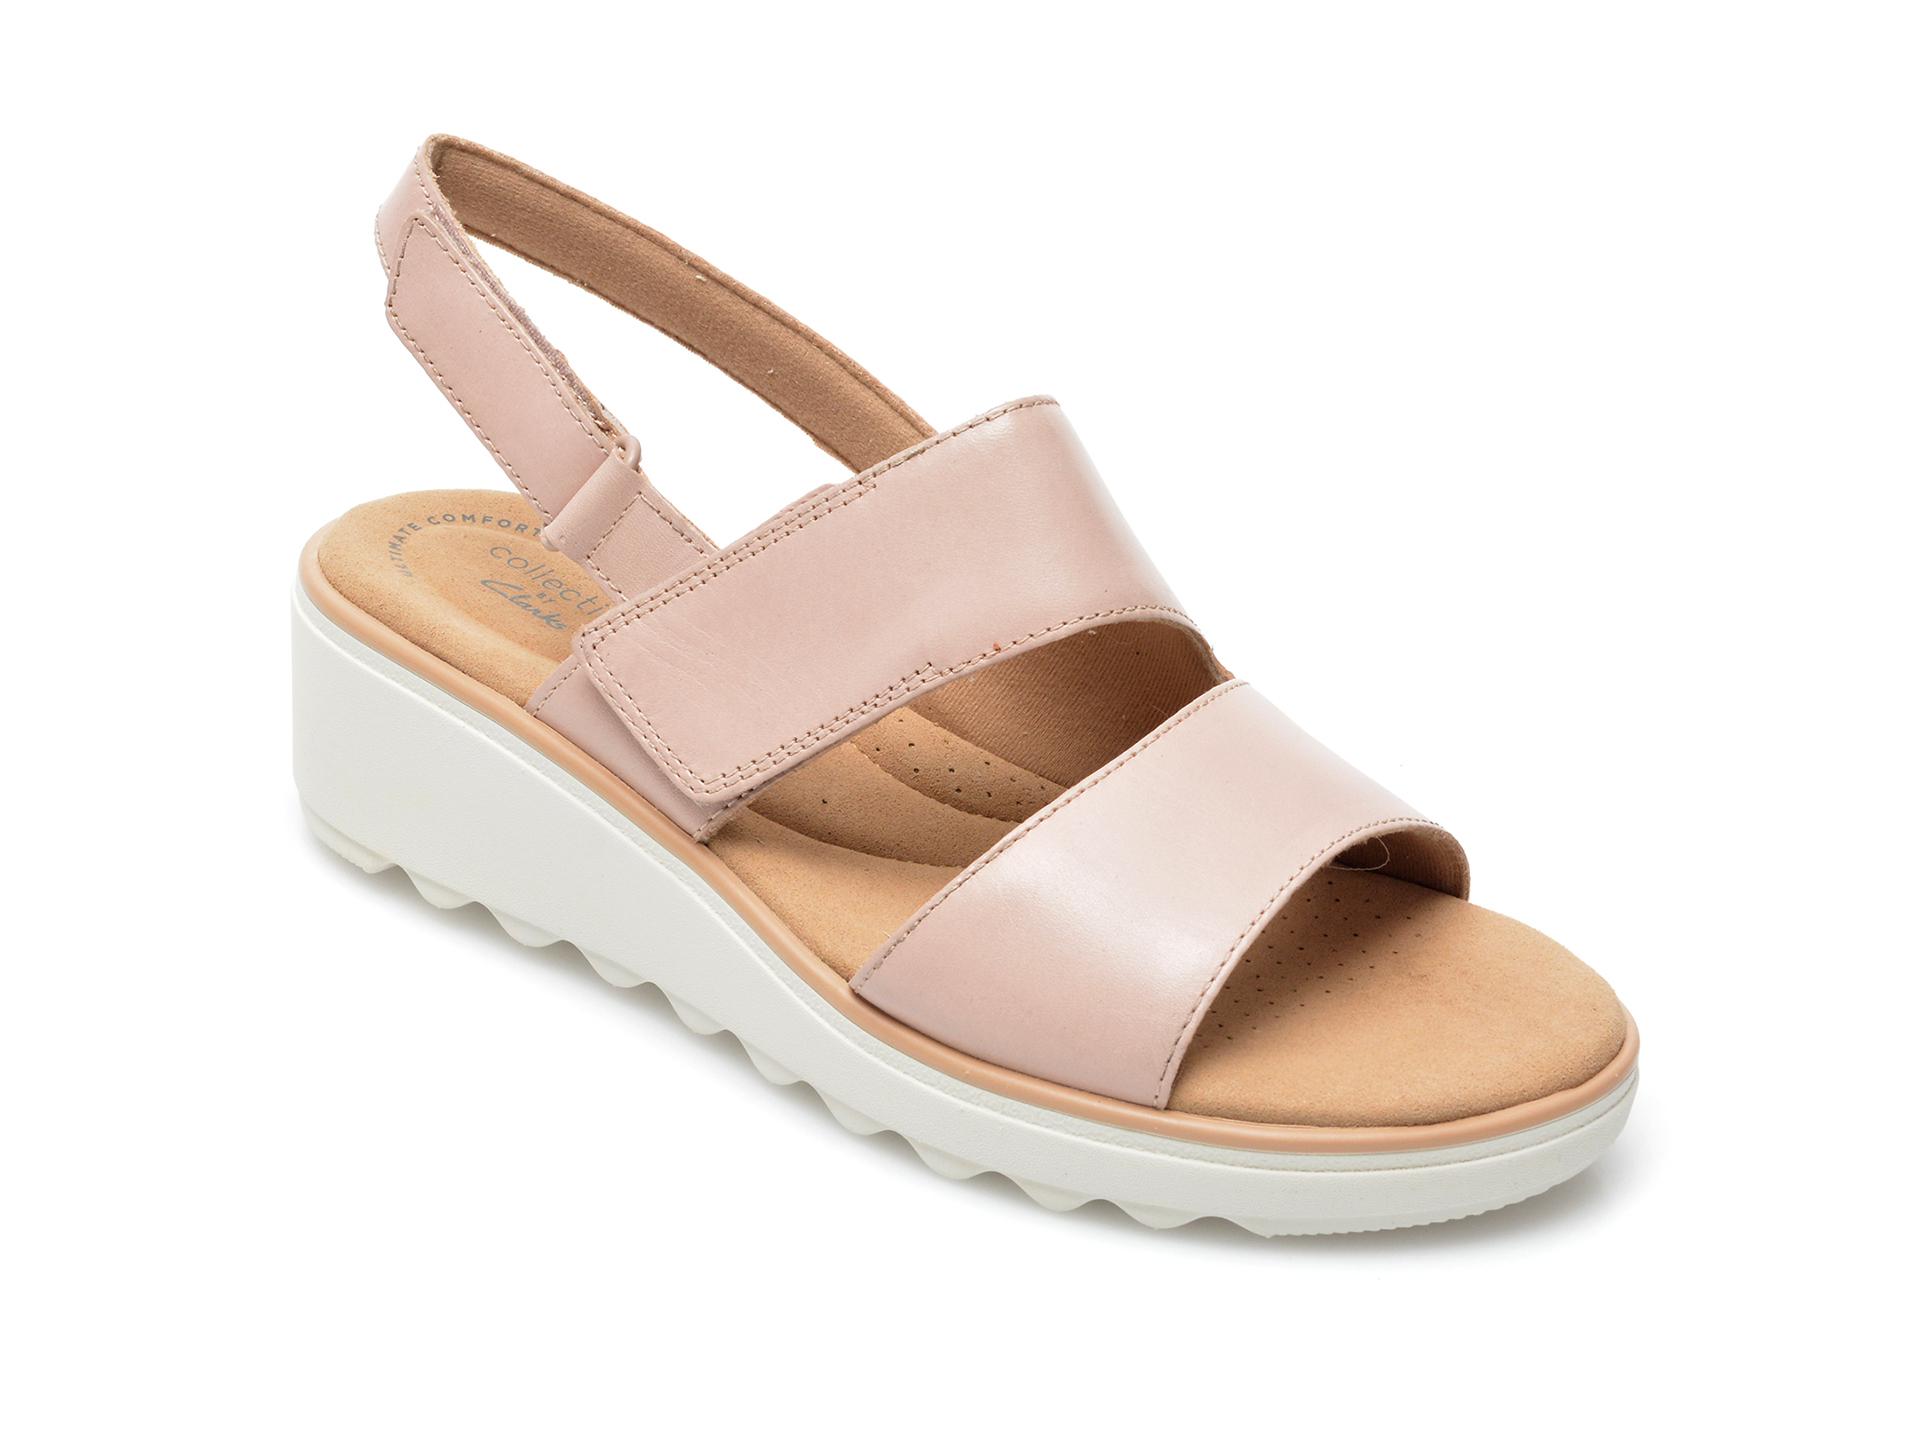 Sandale CLARKS nude, Jillian Pearl, din piele naturala imagine otter.ro 2021